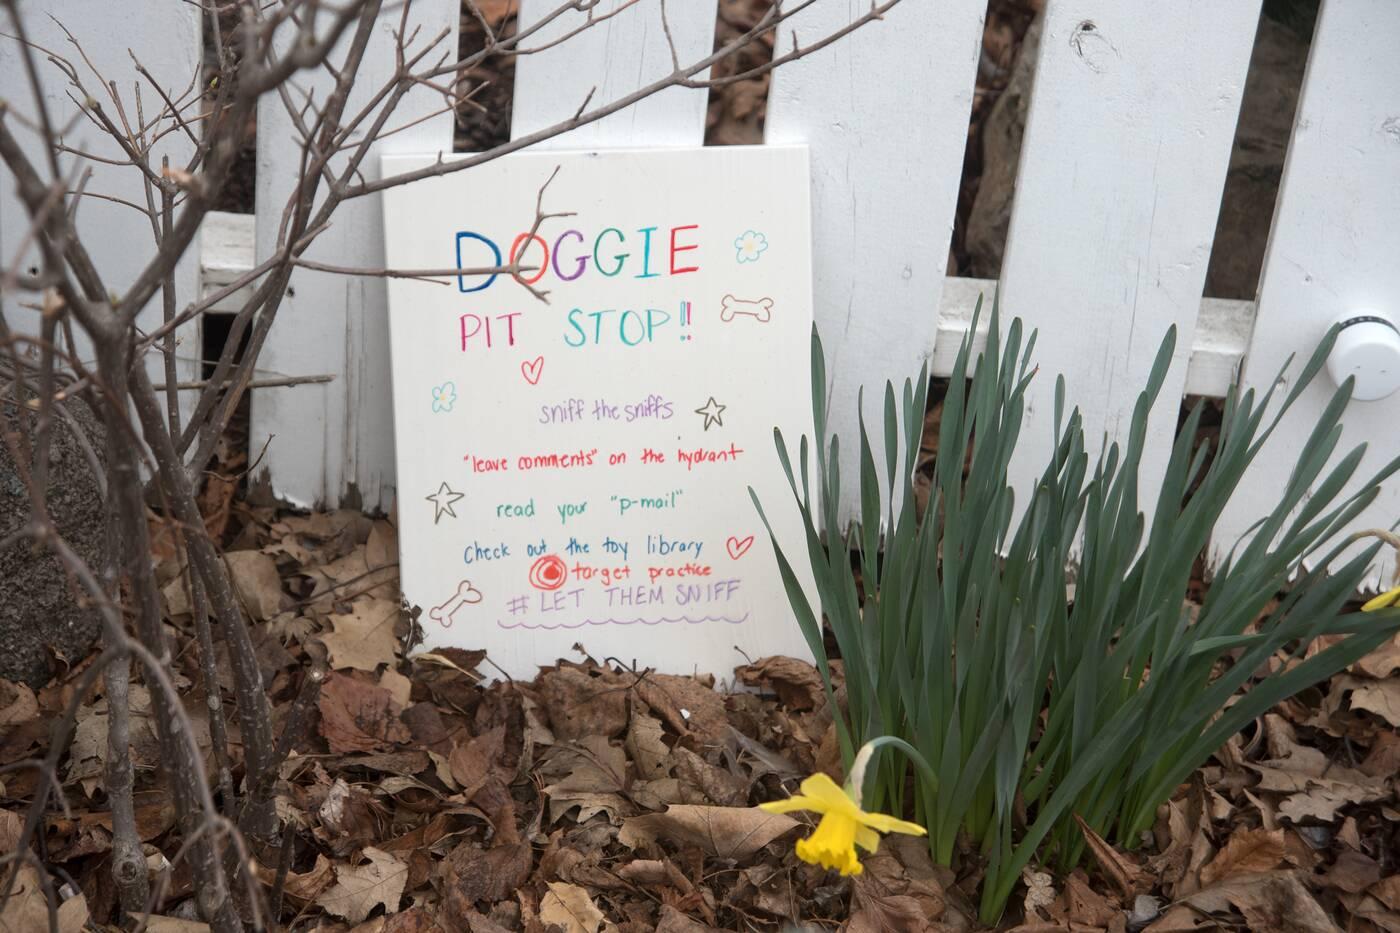 doggie pit stop